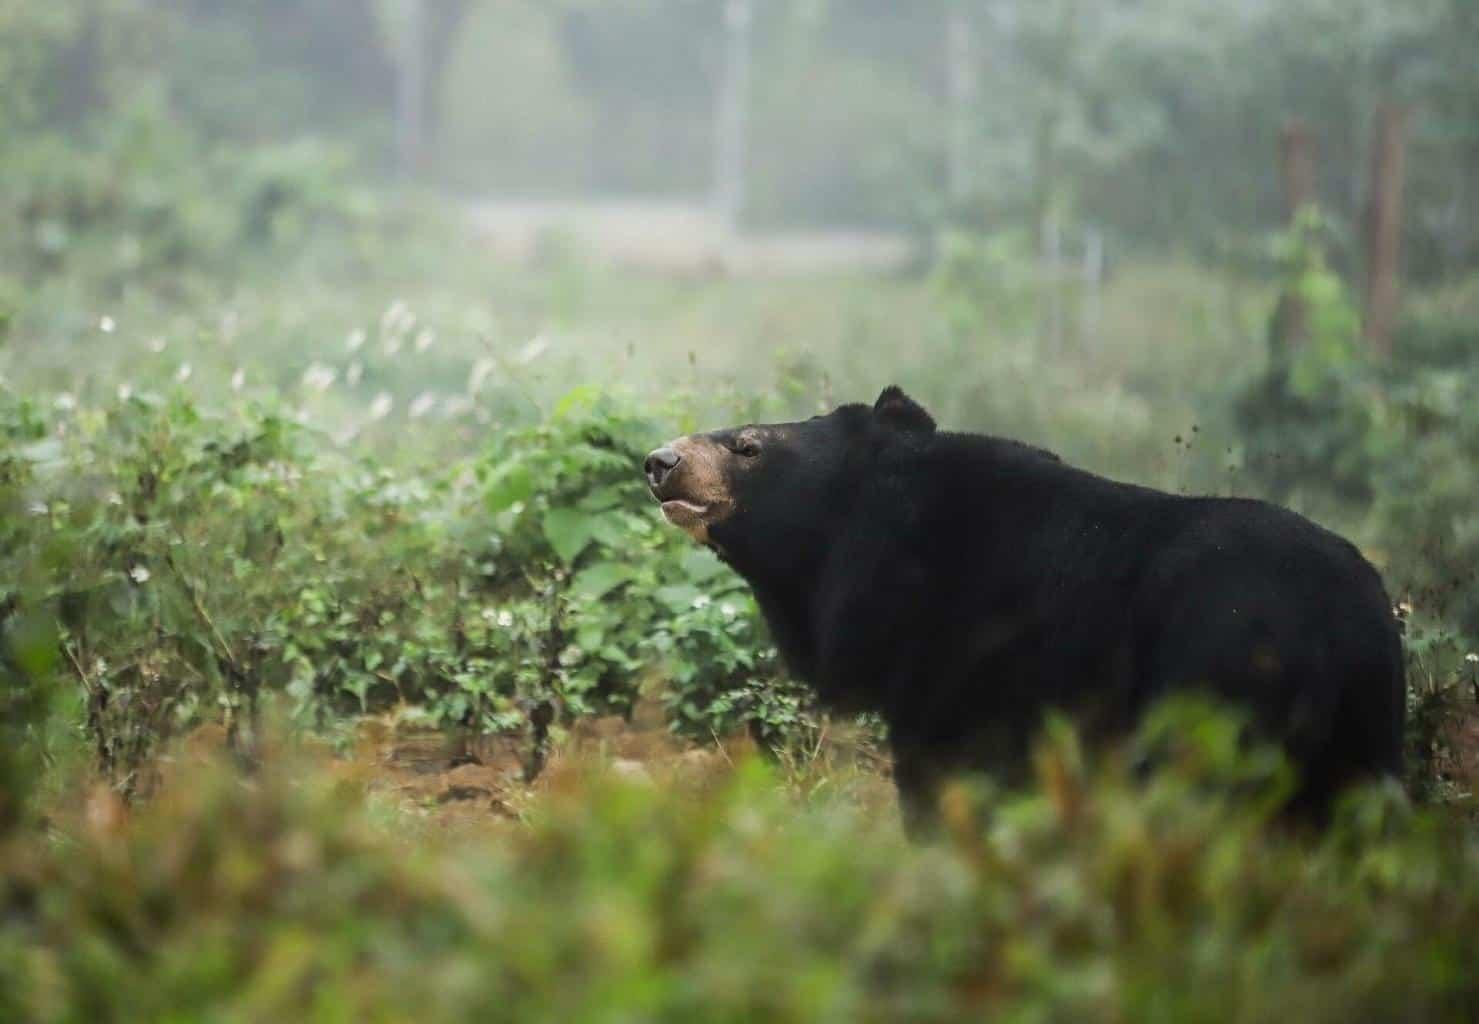 BEAR SANCTUARY Vietnam